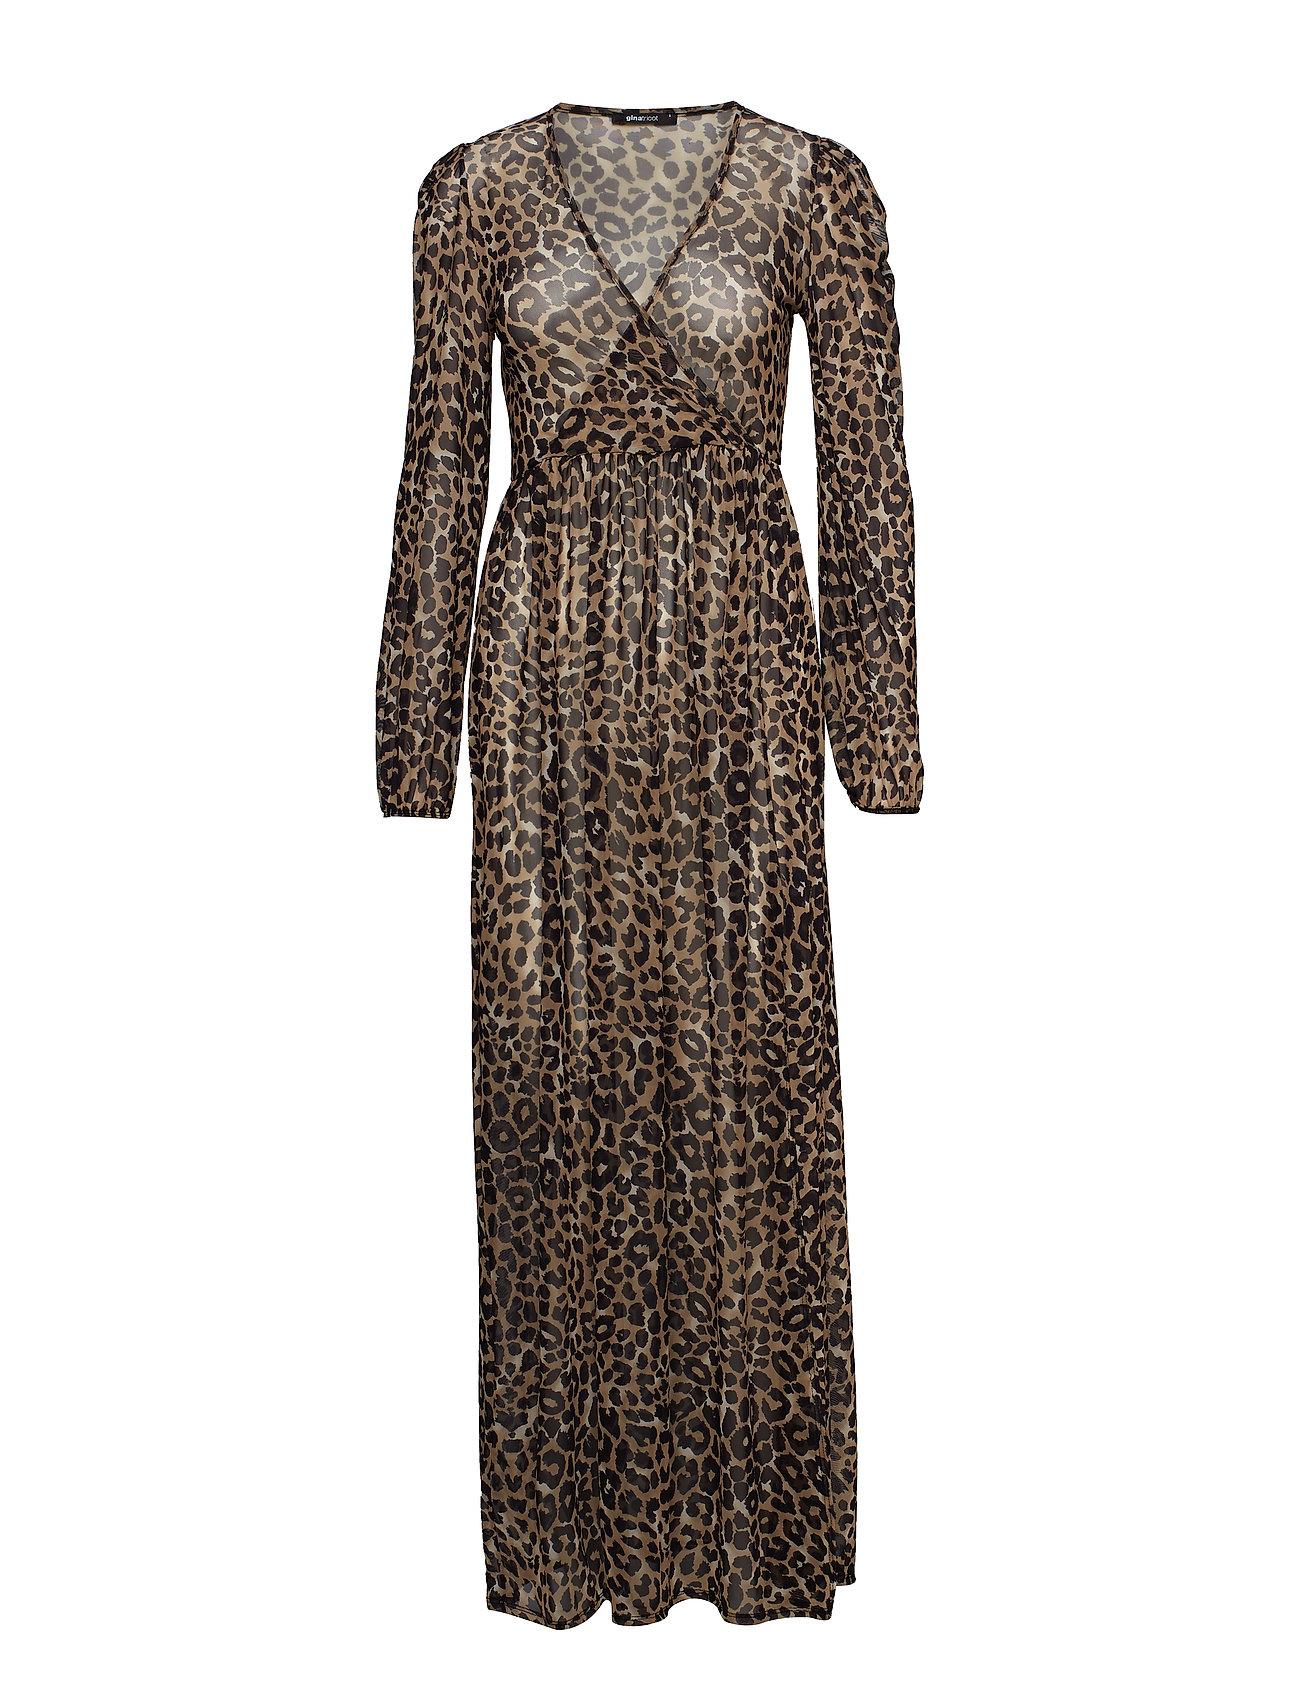 feeb26119ab7fc Leo Maxi Dress (Leo aop) (£40.50) - Gina Tricot -